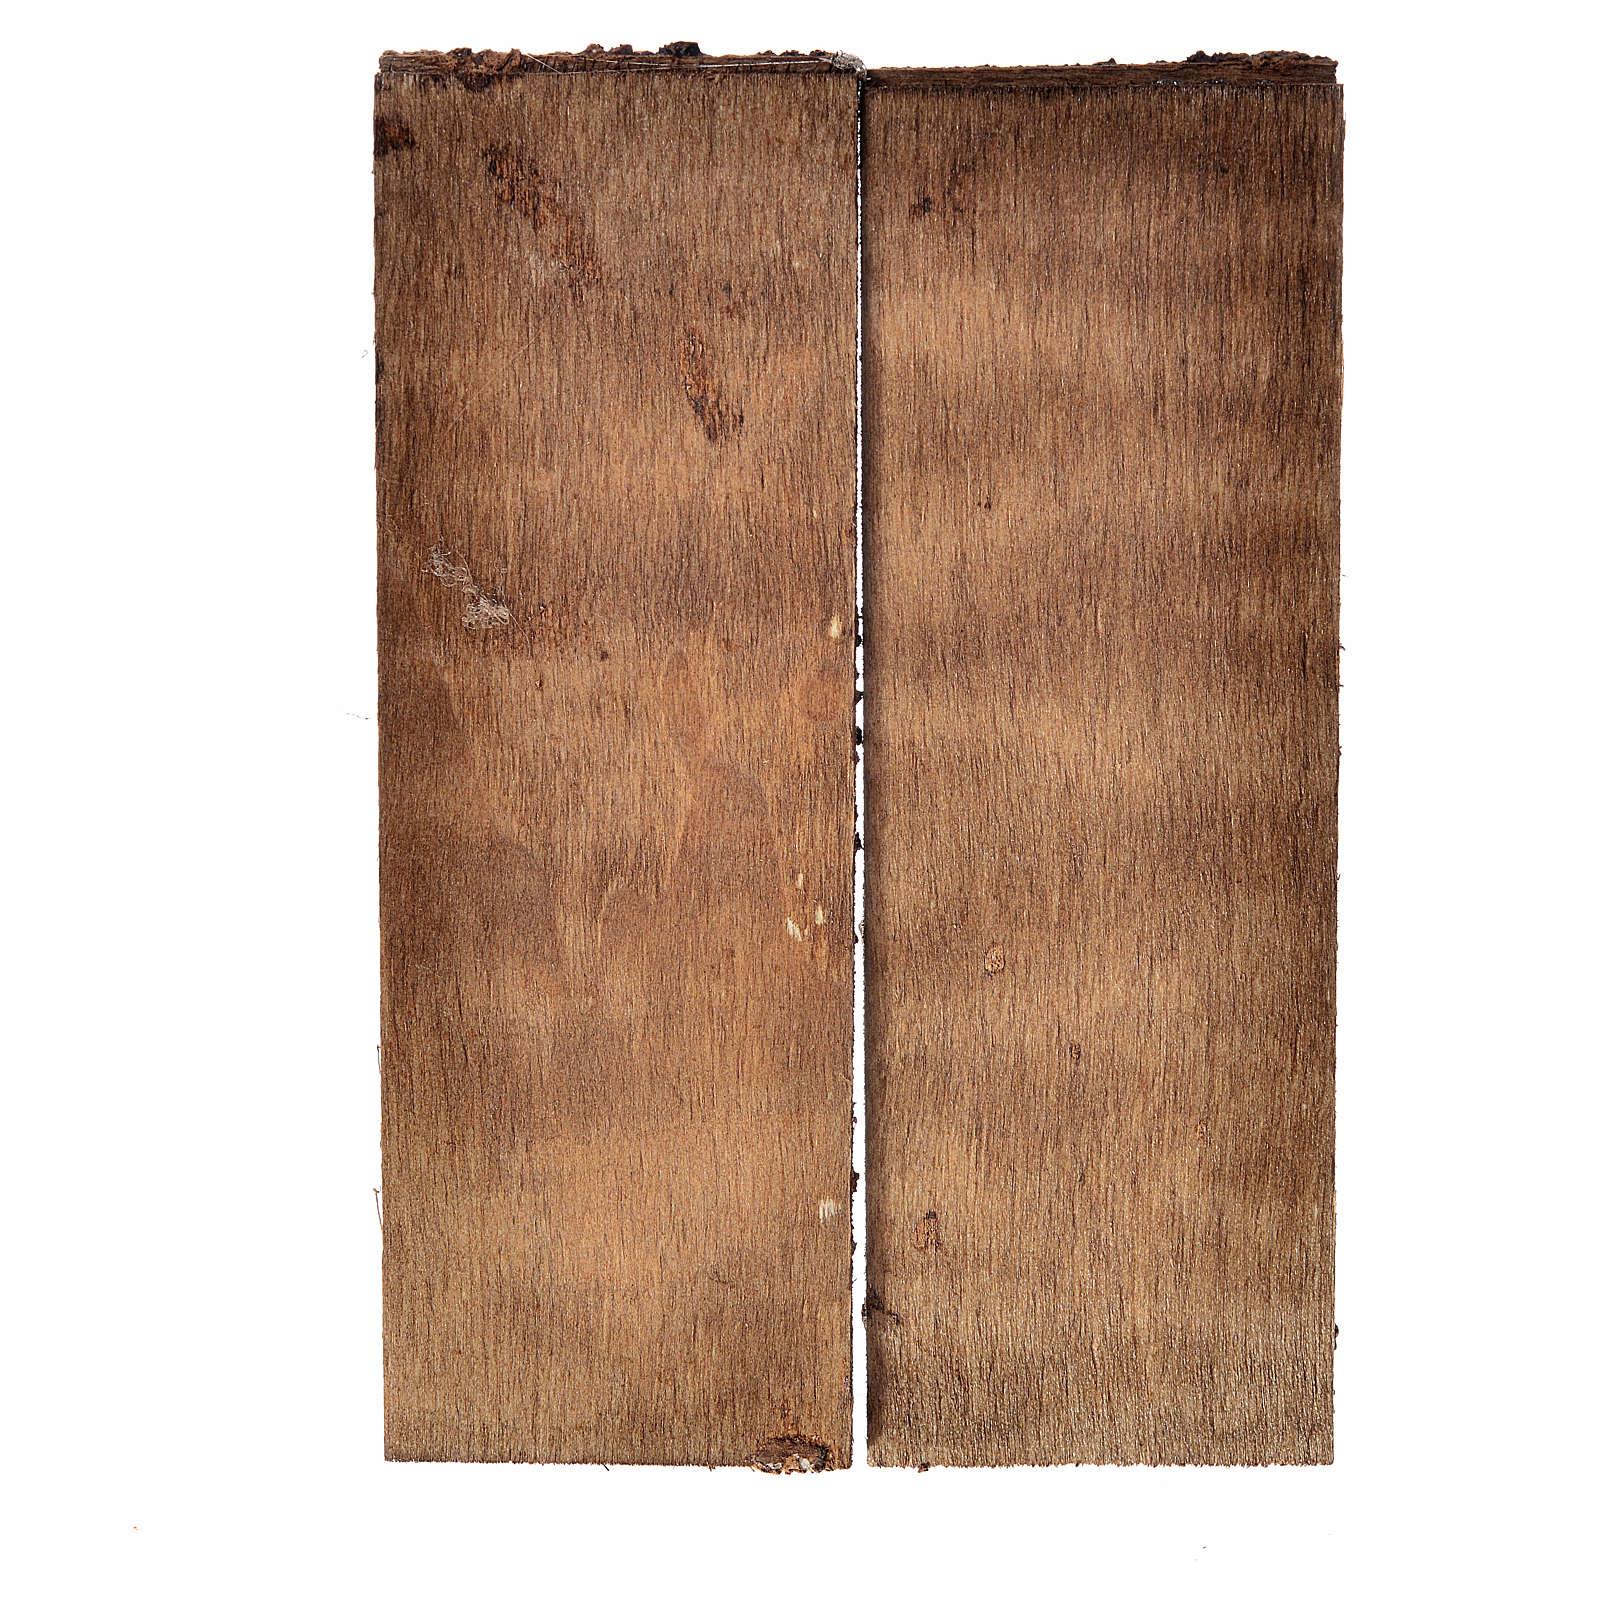 Porta in legno 2 ante 12x9 cm per presepe fai da te 4